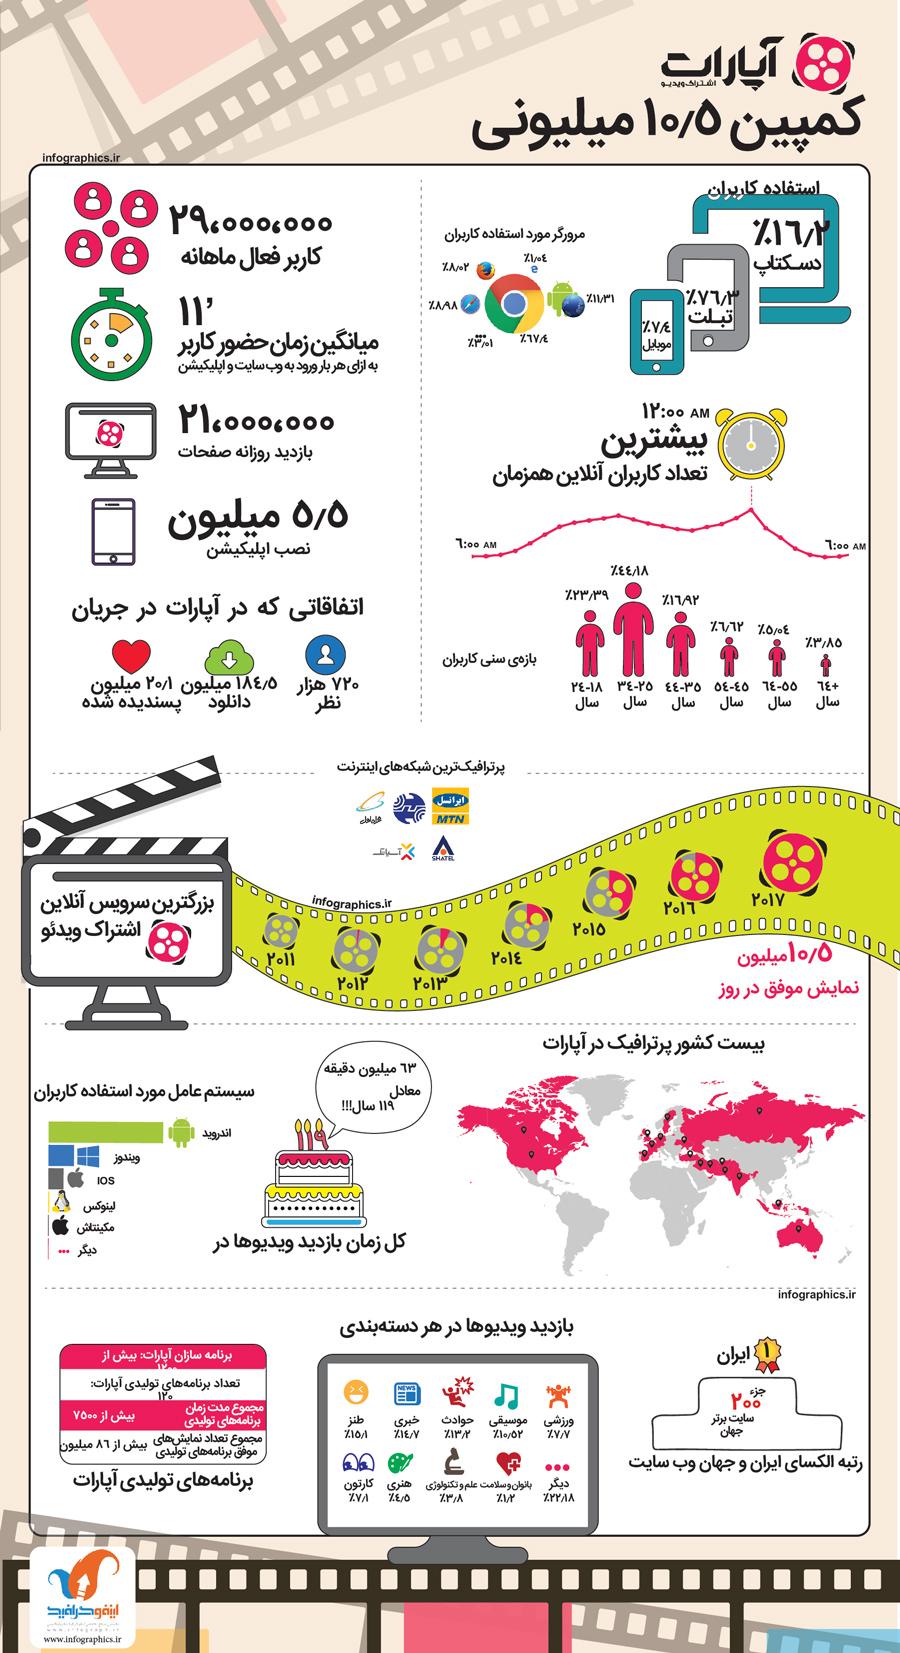 اینفوگرافیک کمپین 10.5 میلیونی آپارات-3